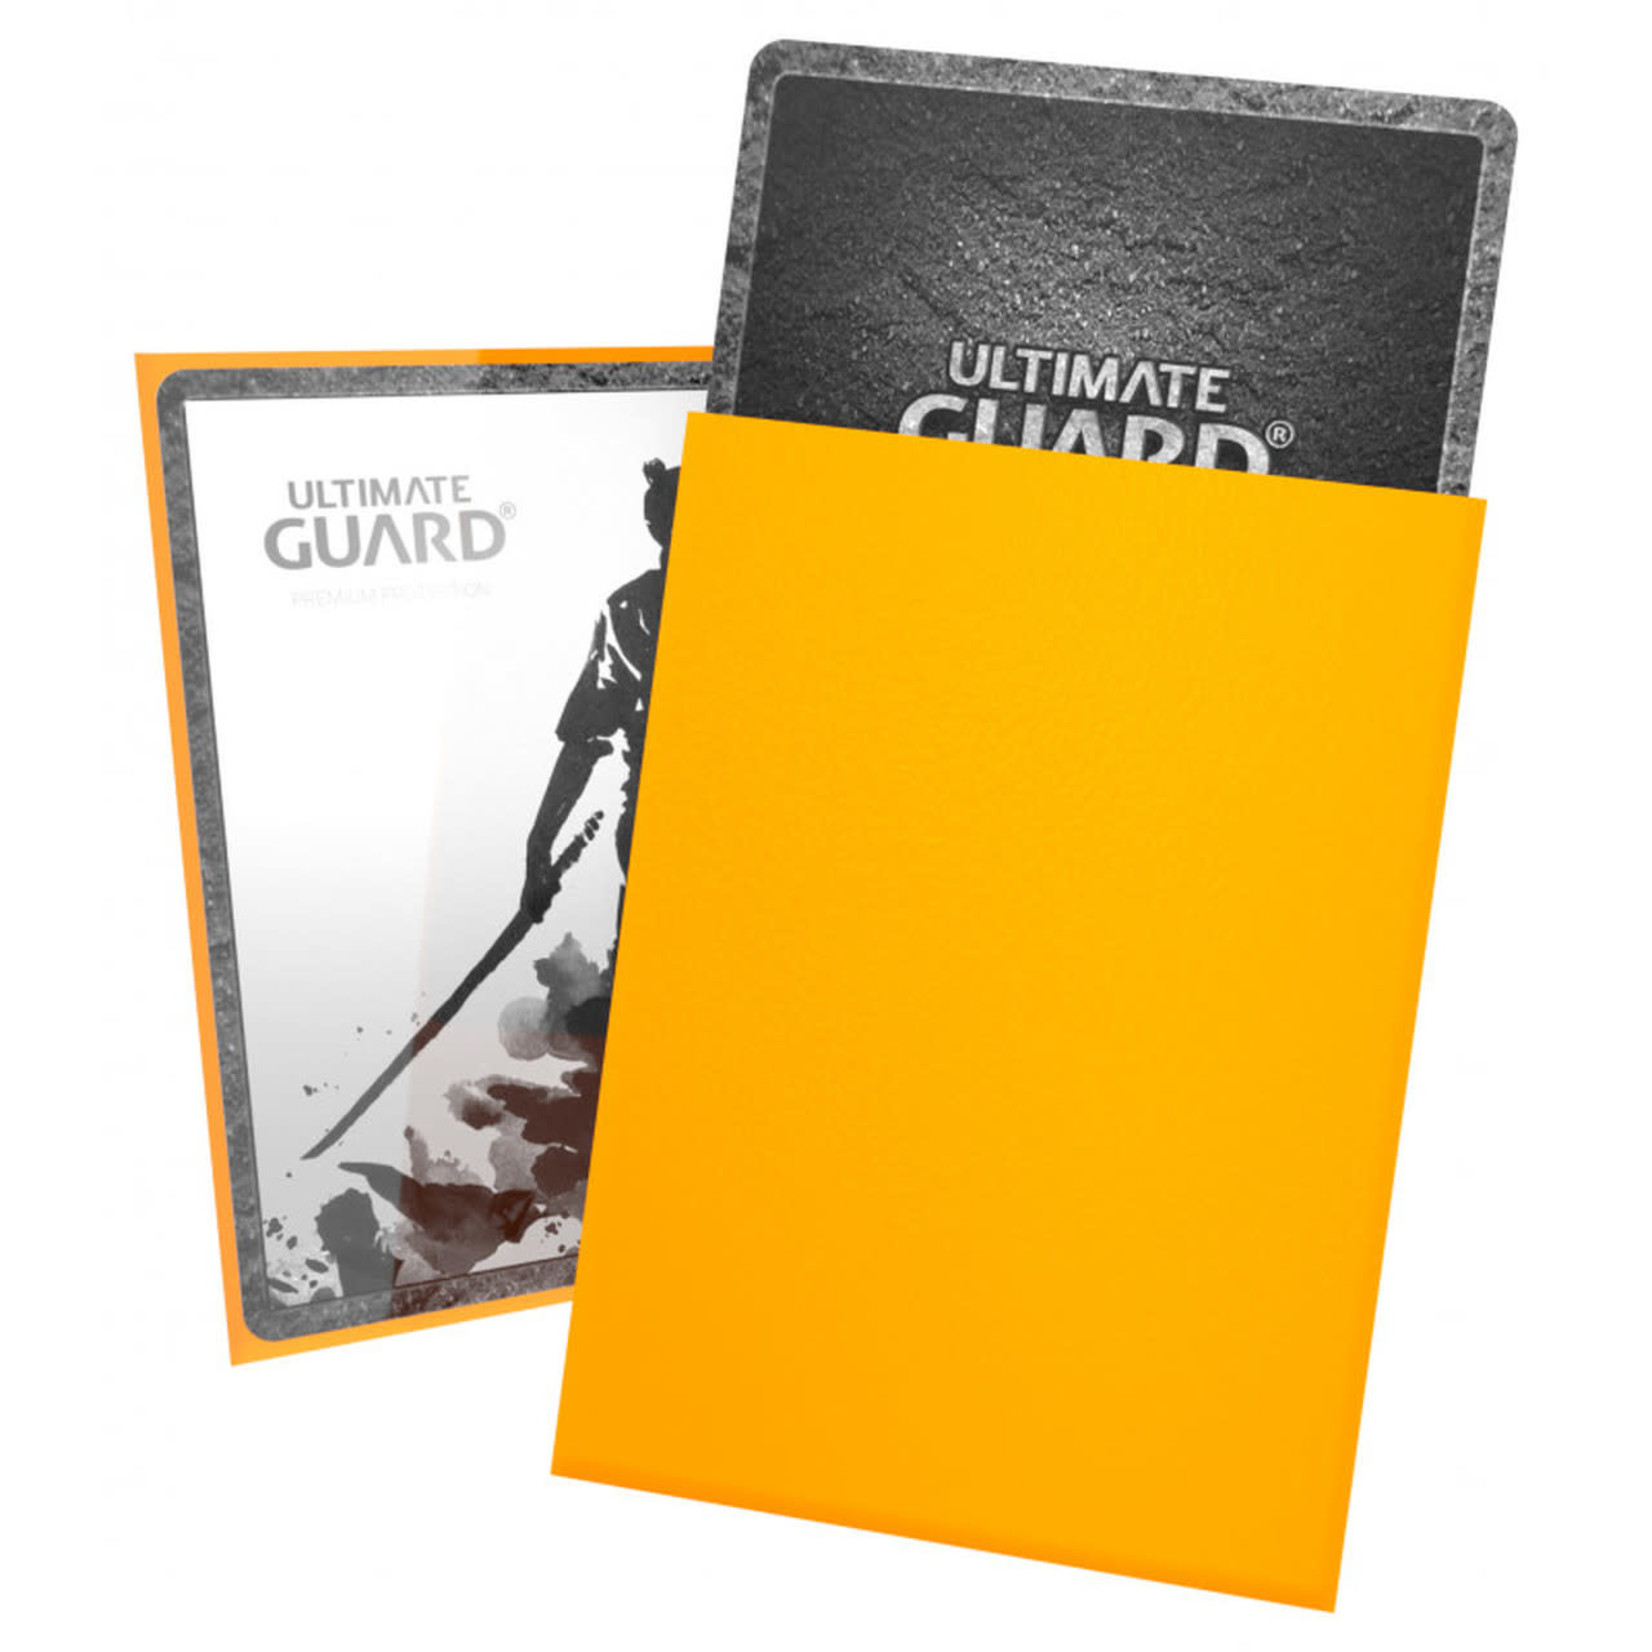 Ultimate Guard Ultimate Guard: Card Sleeves -Katana Yellow (100)